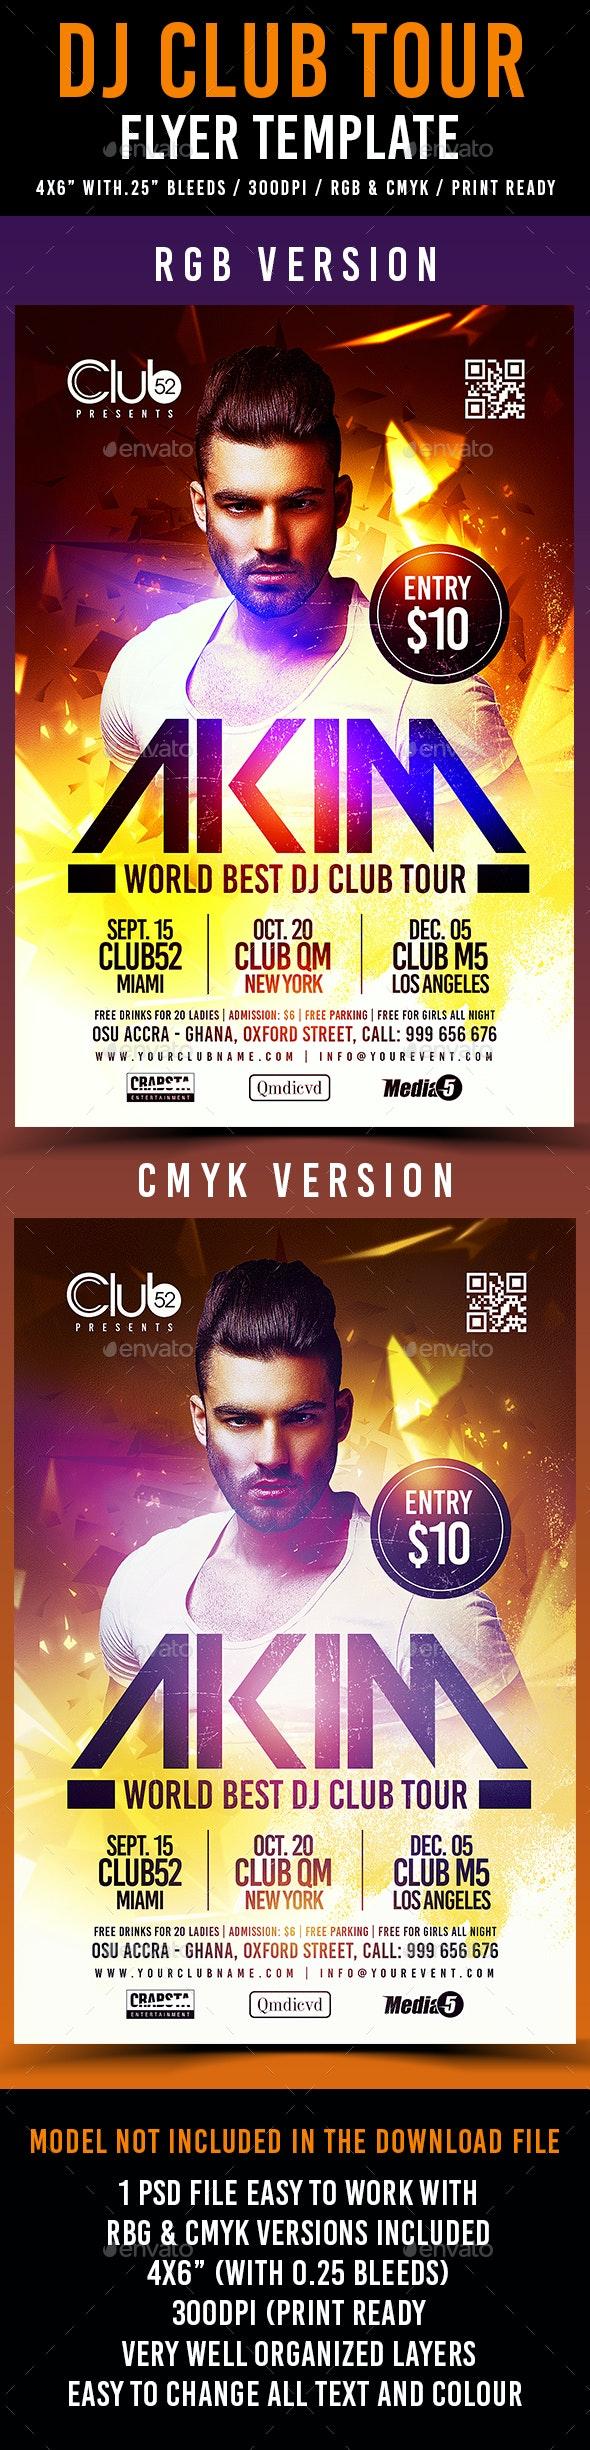 DJ Club Tour Flyer Template  - Clubs & Parties Events